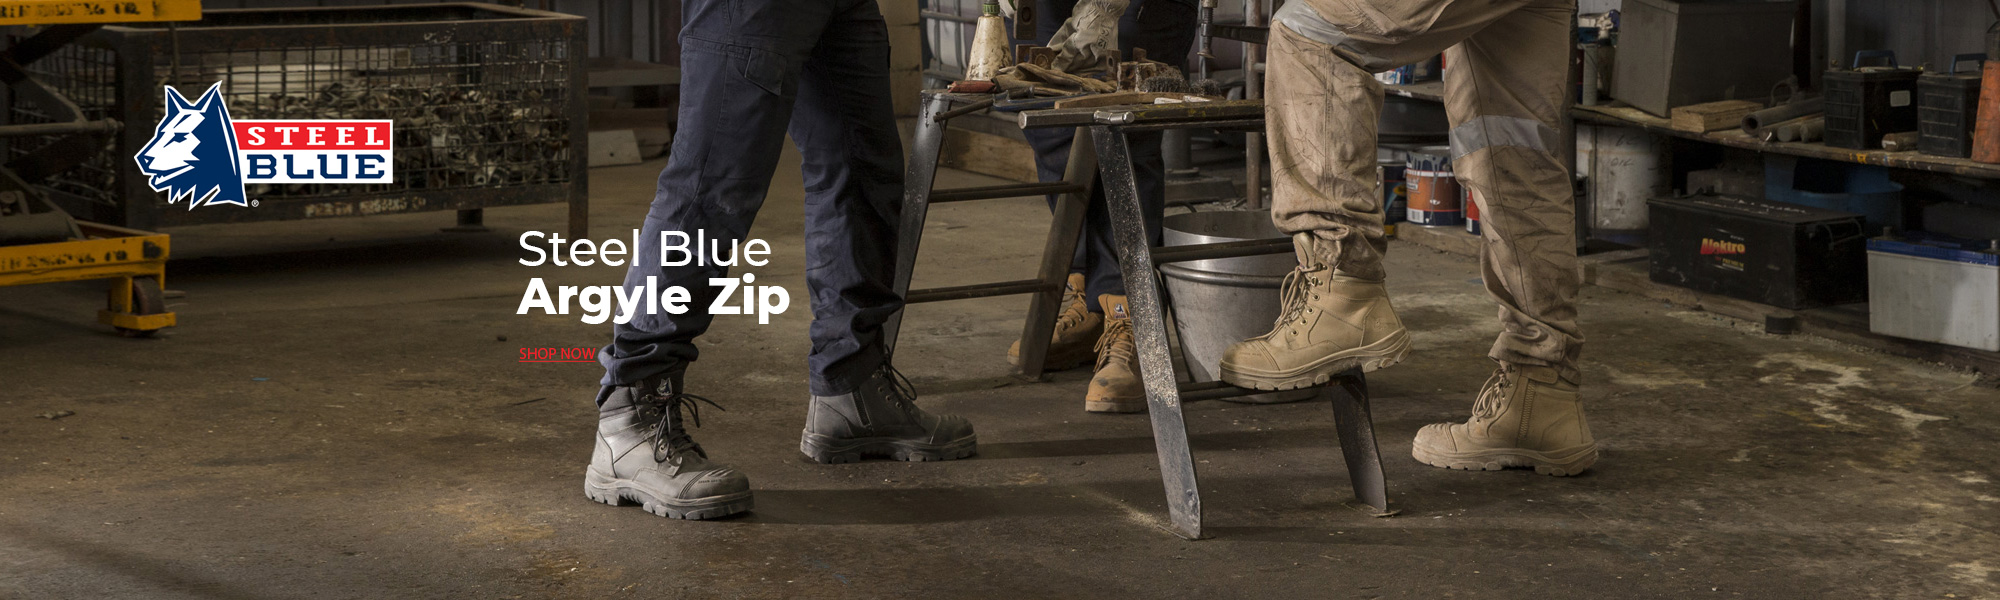 steelblue argyle zip